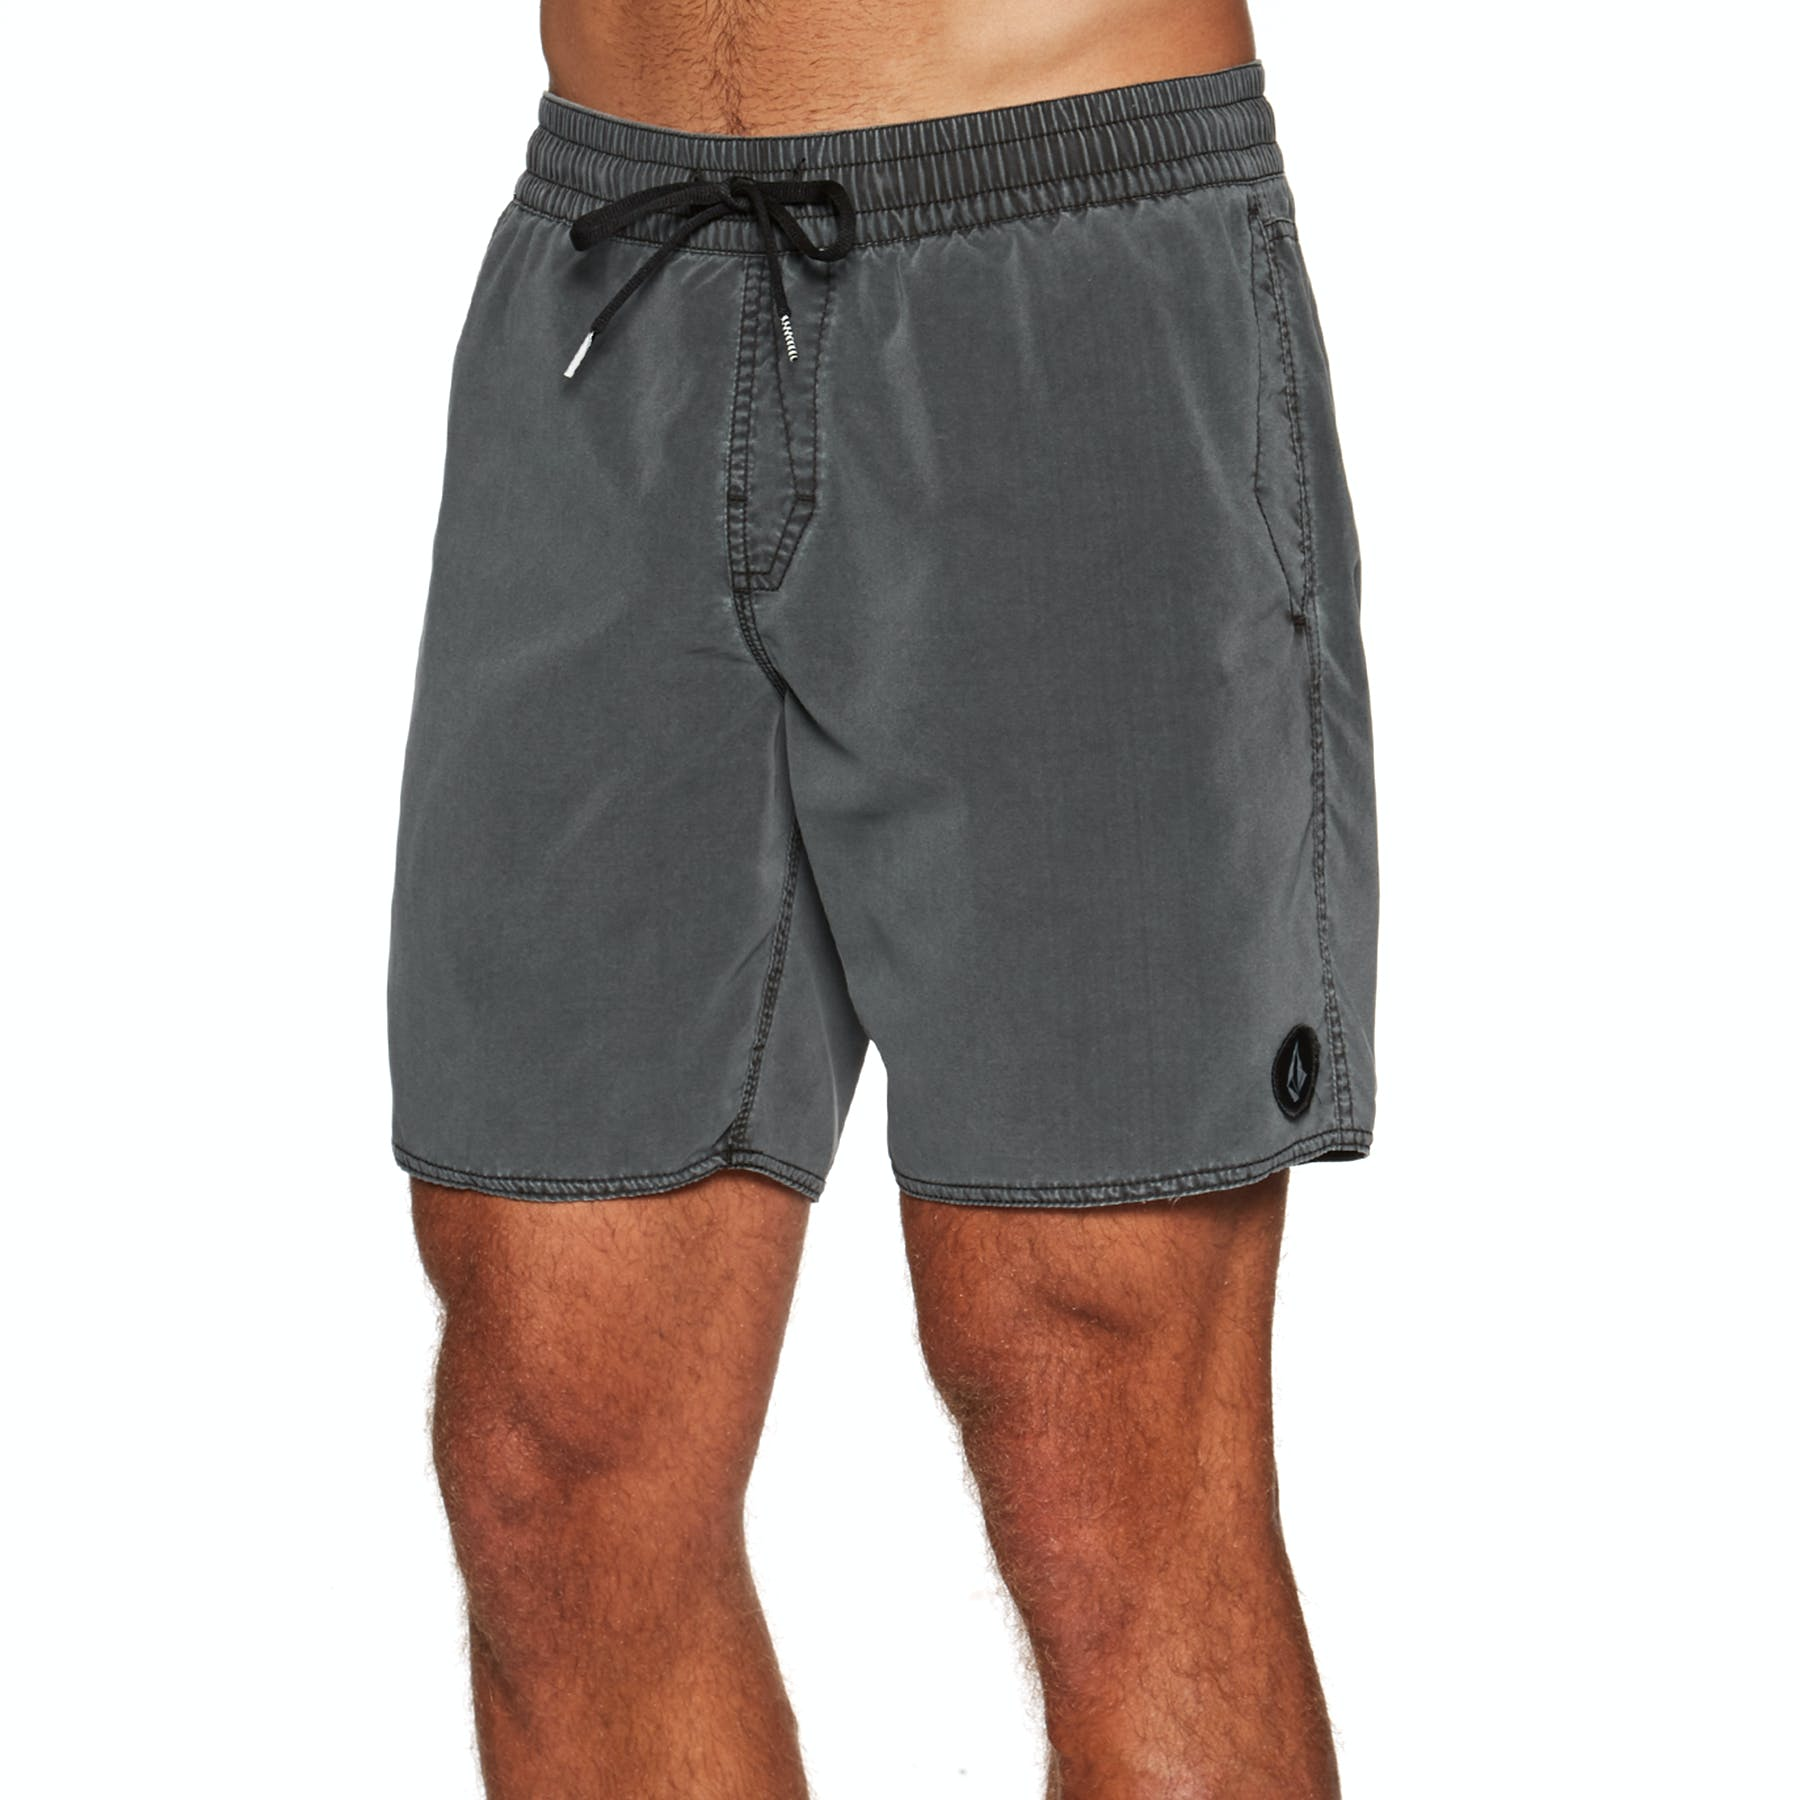 Volcom Center Trunk 17 Elasticated Boardshorts in Black